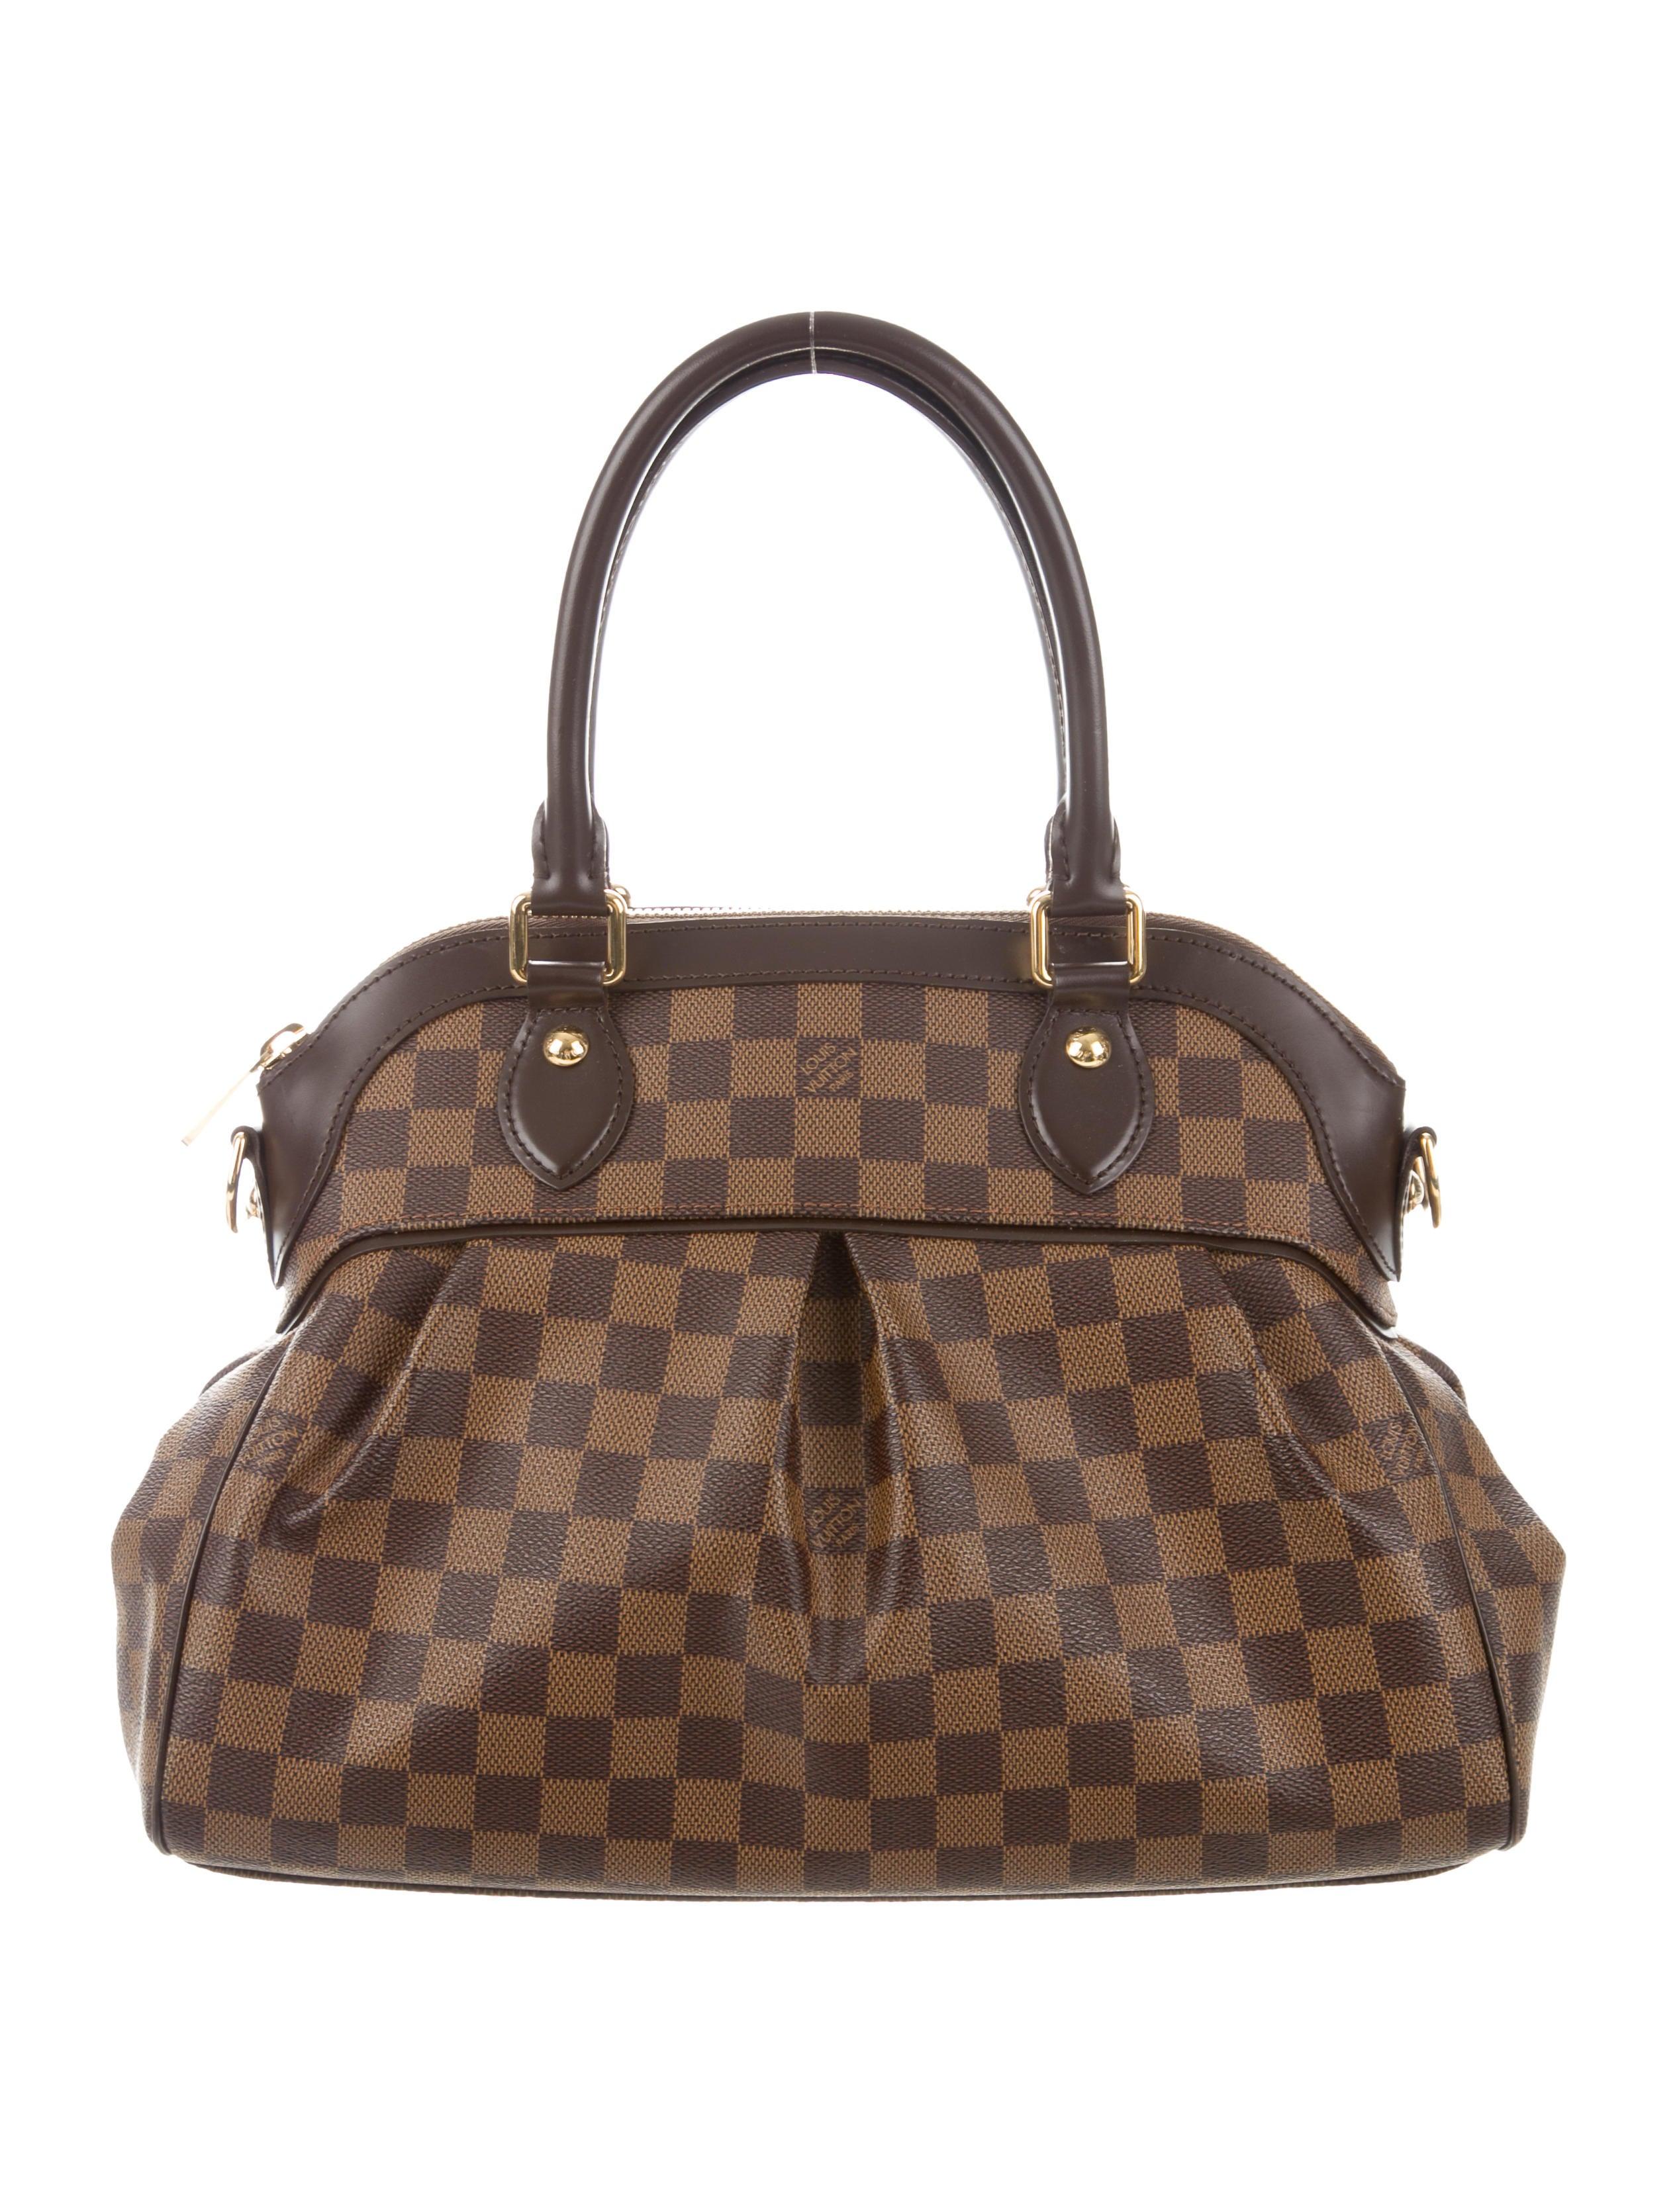 Louis Vuitton Damier Ebene Trevi GM - Handbags - LOU213581  e48ff292d39bd